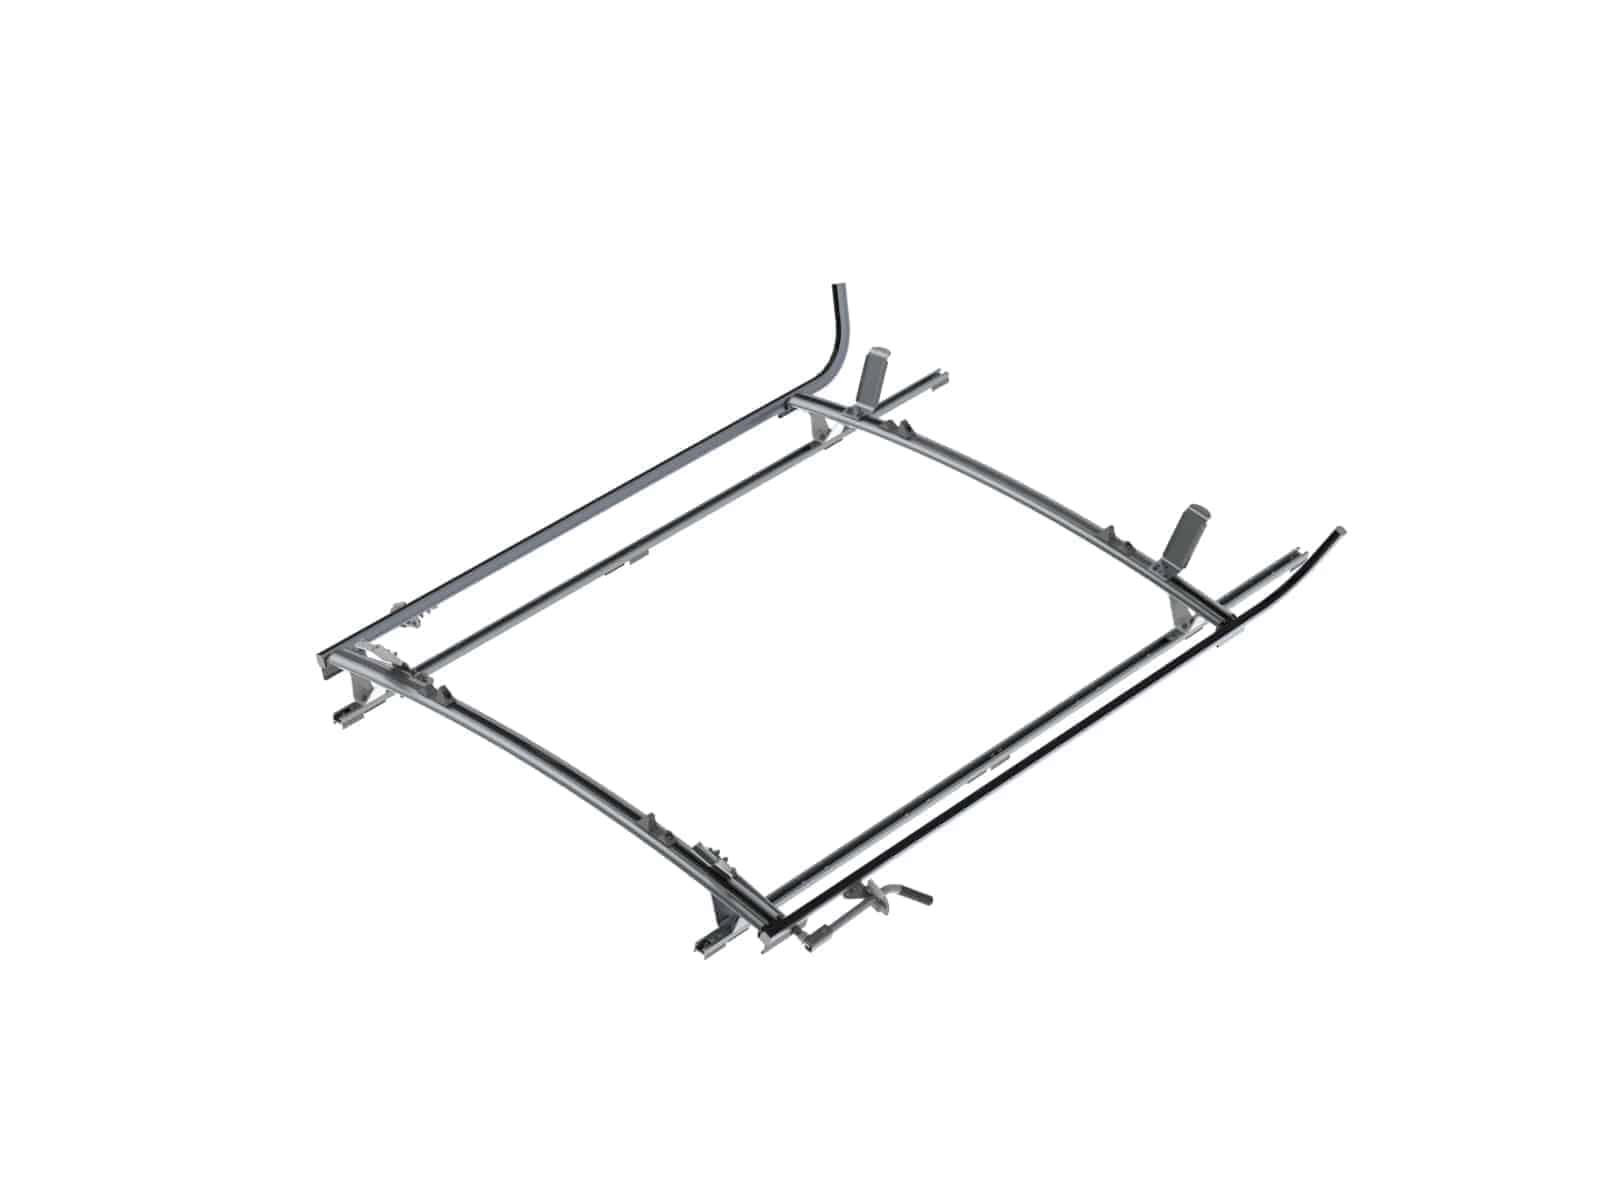 Double Side Ram Promaster Ladder Rack 2 Bar System